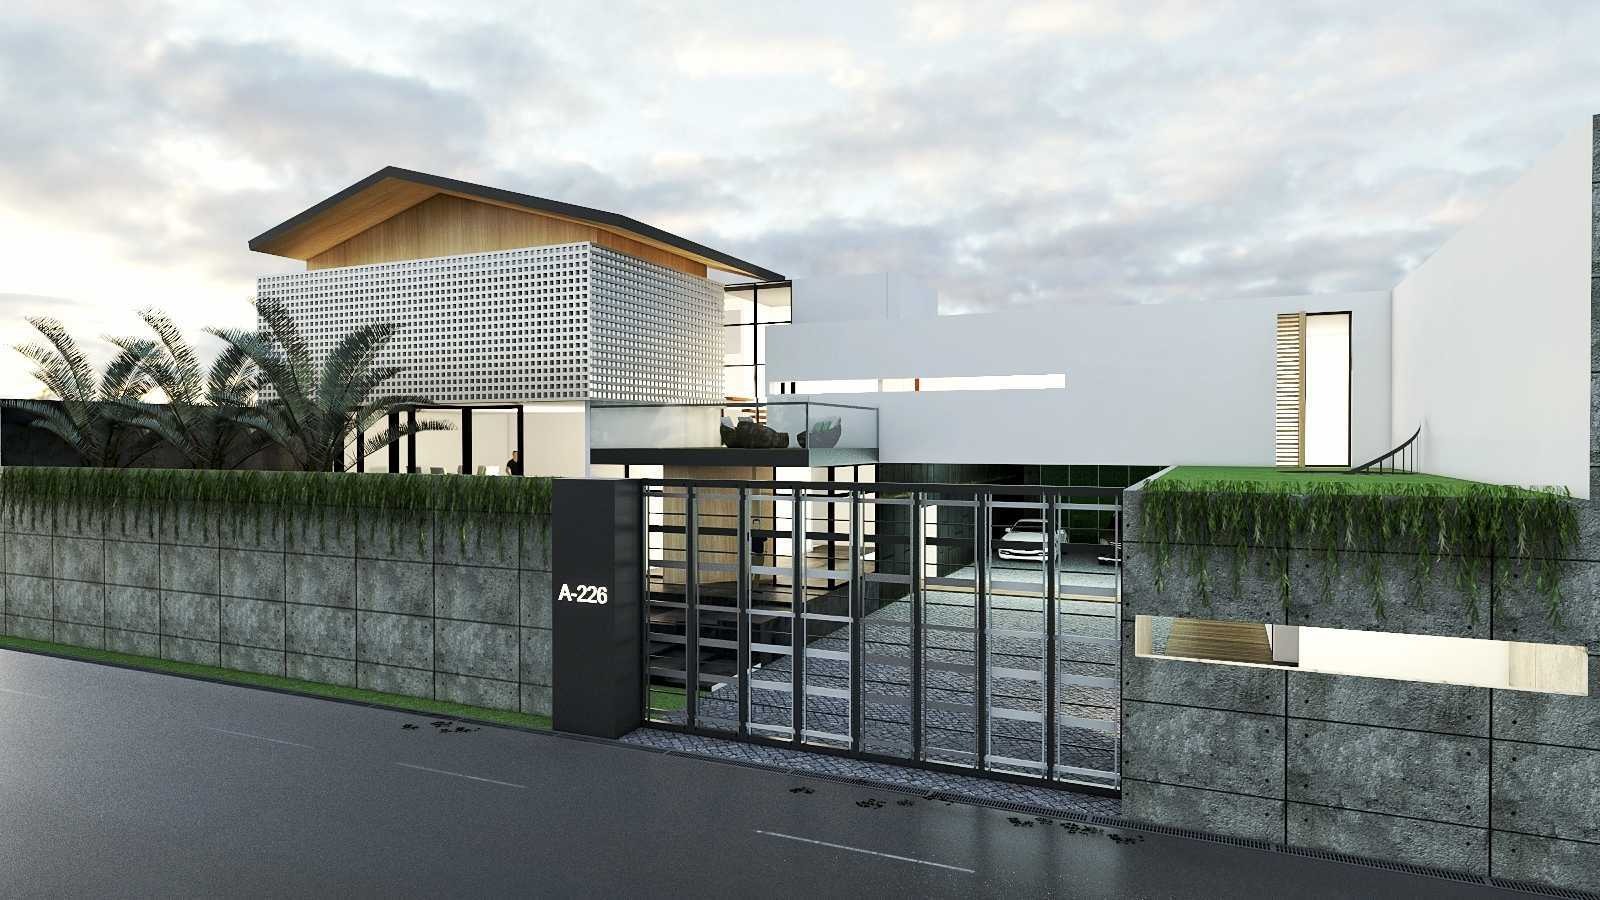 Maxivera Studio Hwb House V1.0 Sidoarjo, Kec. Sidoarjo, Kabupaten Sidoarjo, Jawa Timur, Indonesia Sidoarjo, Kec. Sidoarjo, Kabupaten Sidoarjo, Jawa Timur, Indonesia Maxivera-Studio-Hwb-House-V10  76254